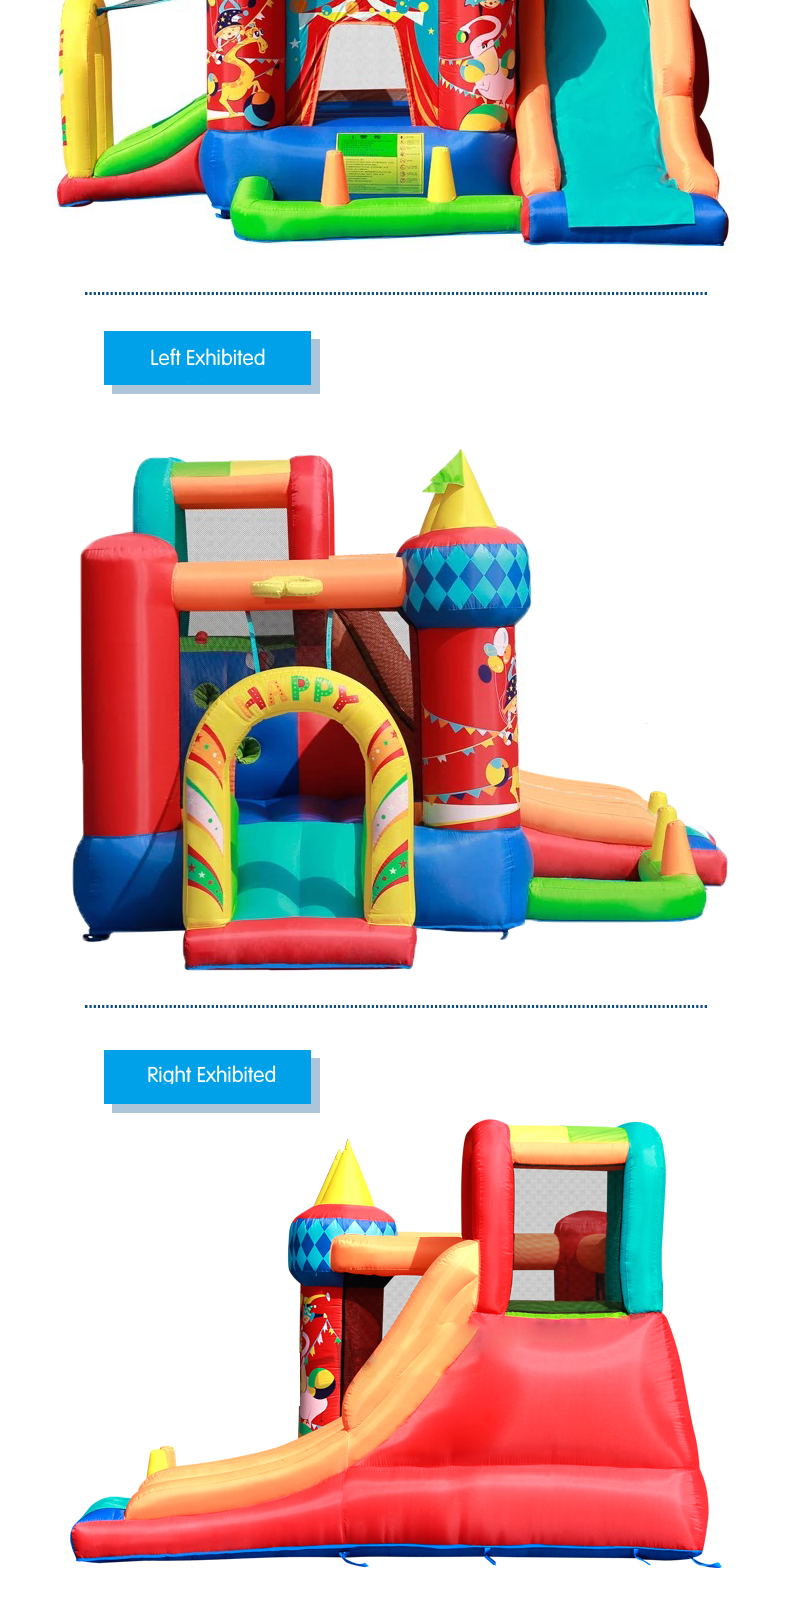 HTB1M85jPFXXXXbbXpXXq6xXFXXXW - Mr. Fun Bouncy Castle Inflatable Bounce House Double Slide For Kids with Blower